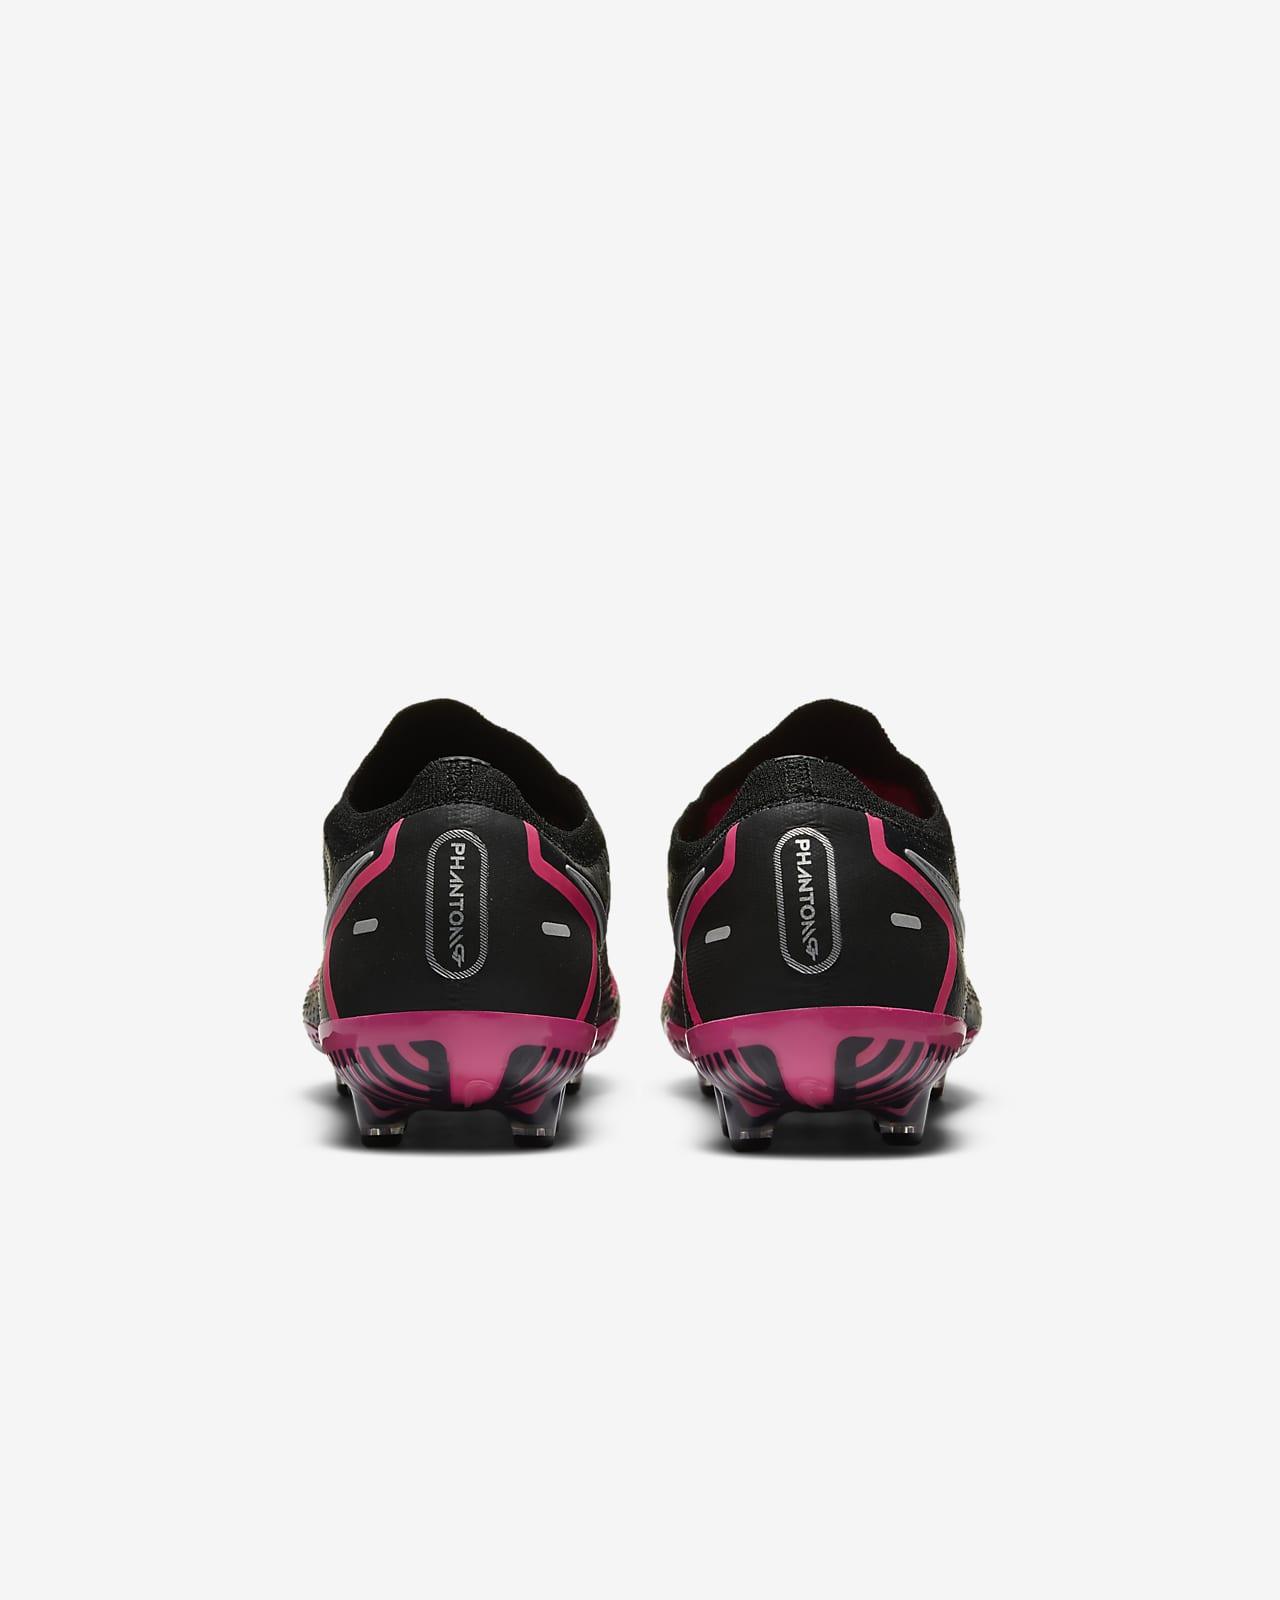 Nike Phantom Vision 2 Elite Dynamic Fit AG PRO Artificial